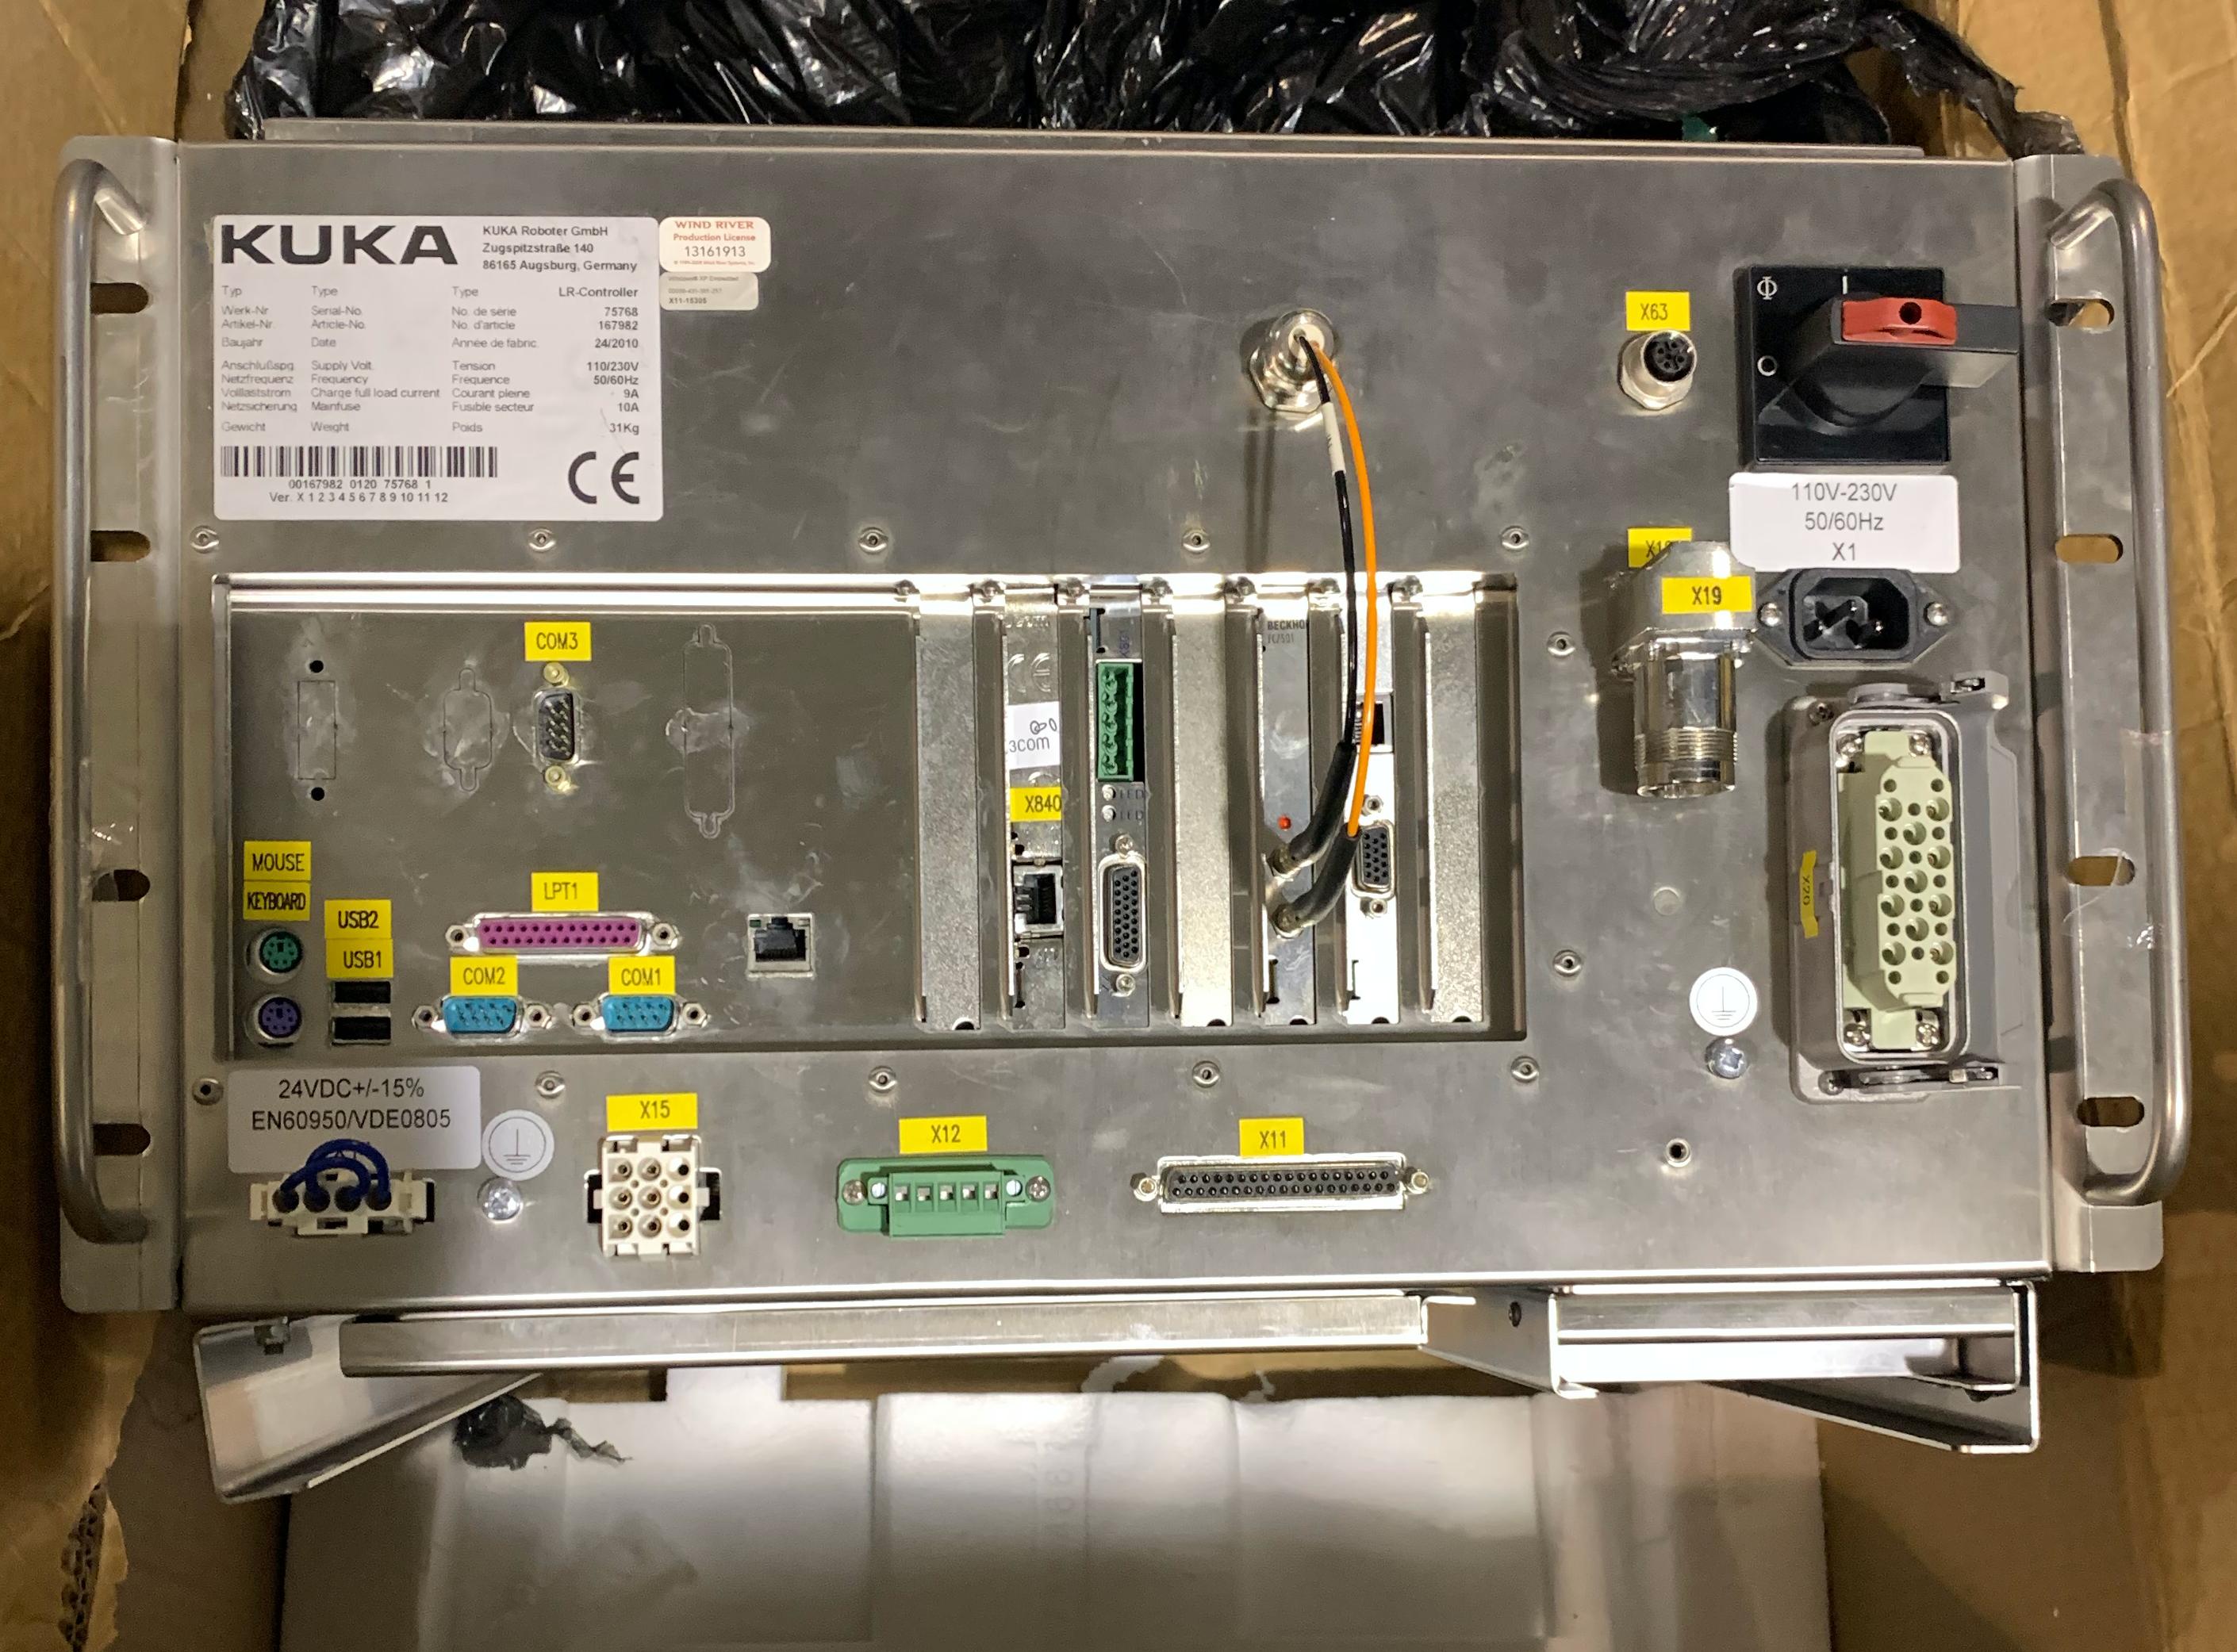 KUKA COLLABORATIVE  LBR 7 AXIS IIWA IV+ 7KG X 790R ROBOT WITH LR KUKA CONTROLLER